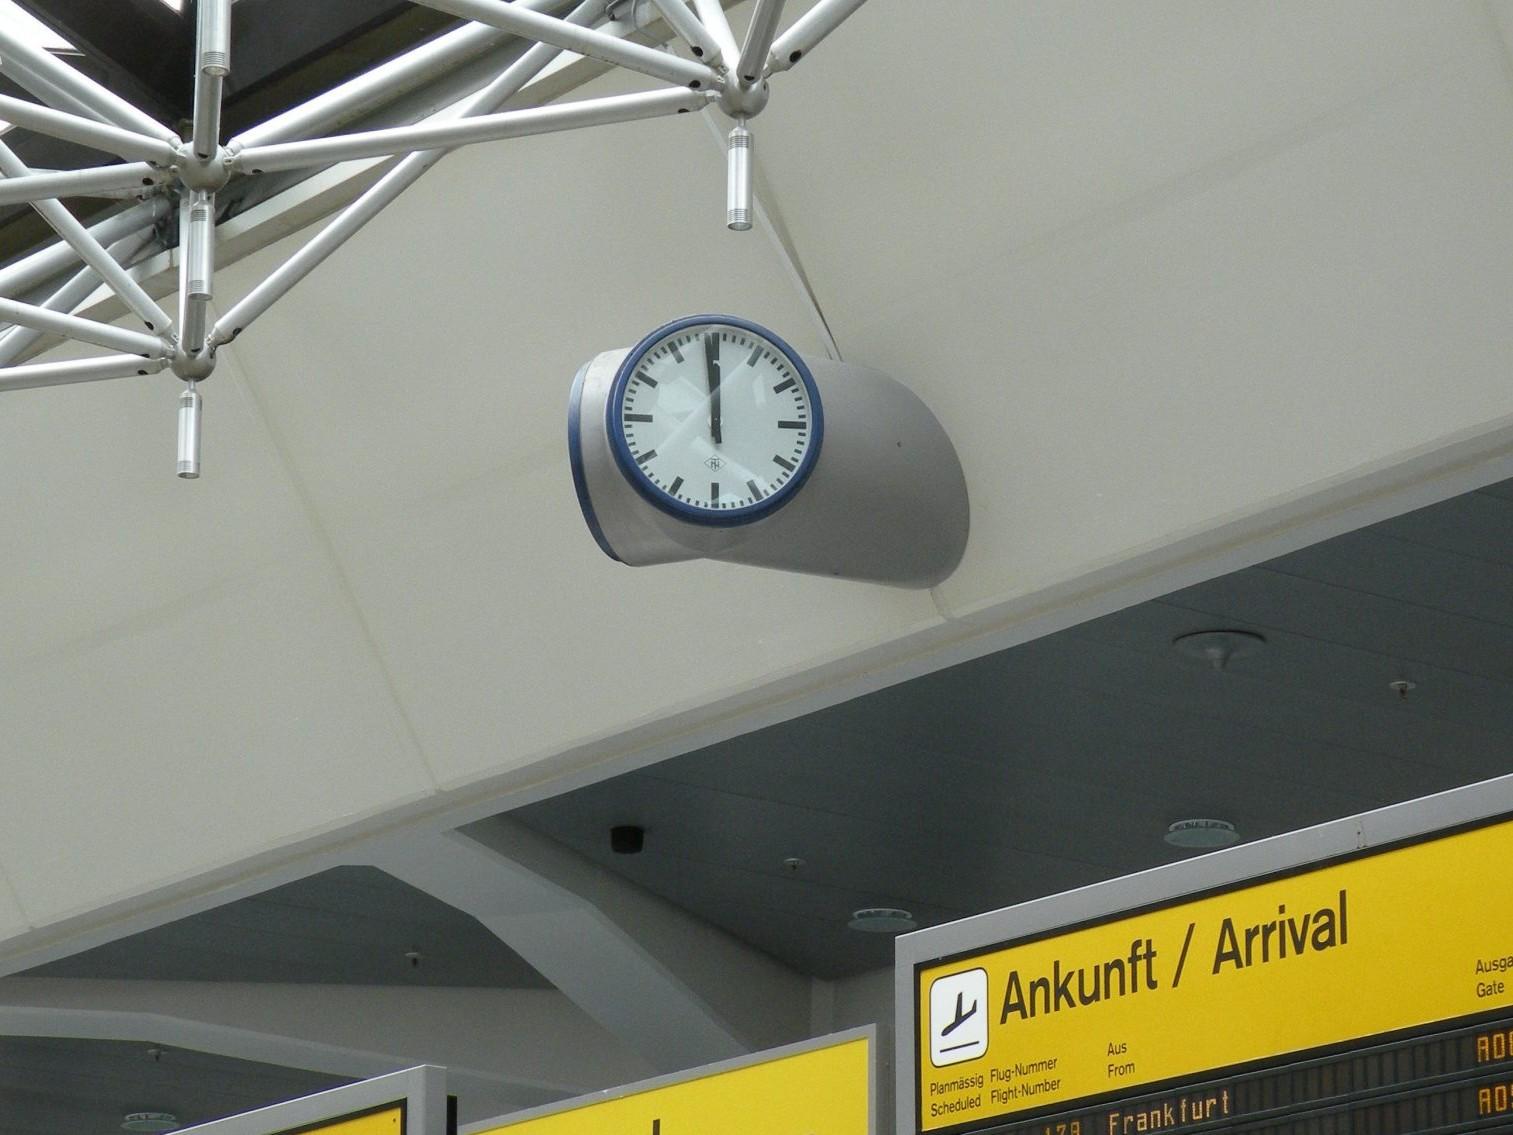 Flughafen Berlin-Tegel (von Gerkan, Marg u. Partner, 1965-74) - Foto: Stefan Rethfeld